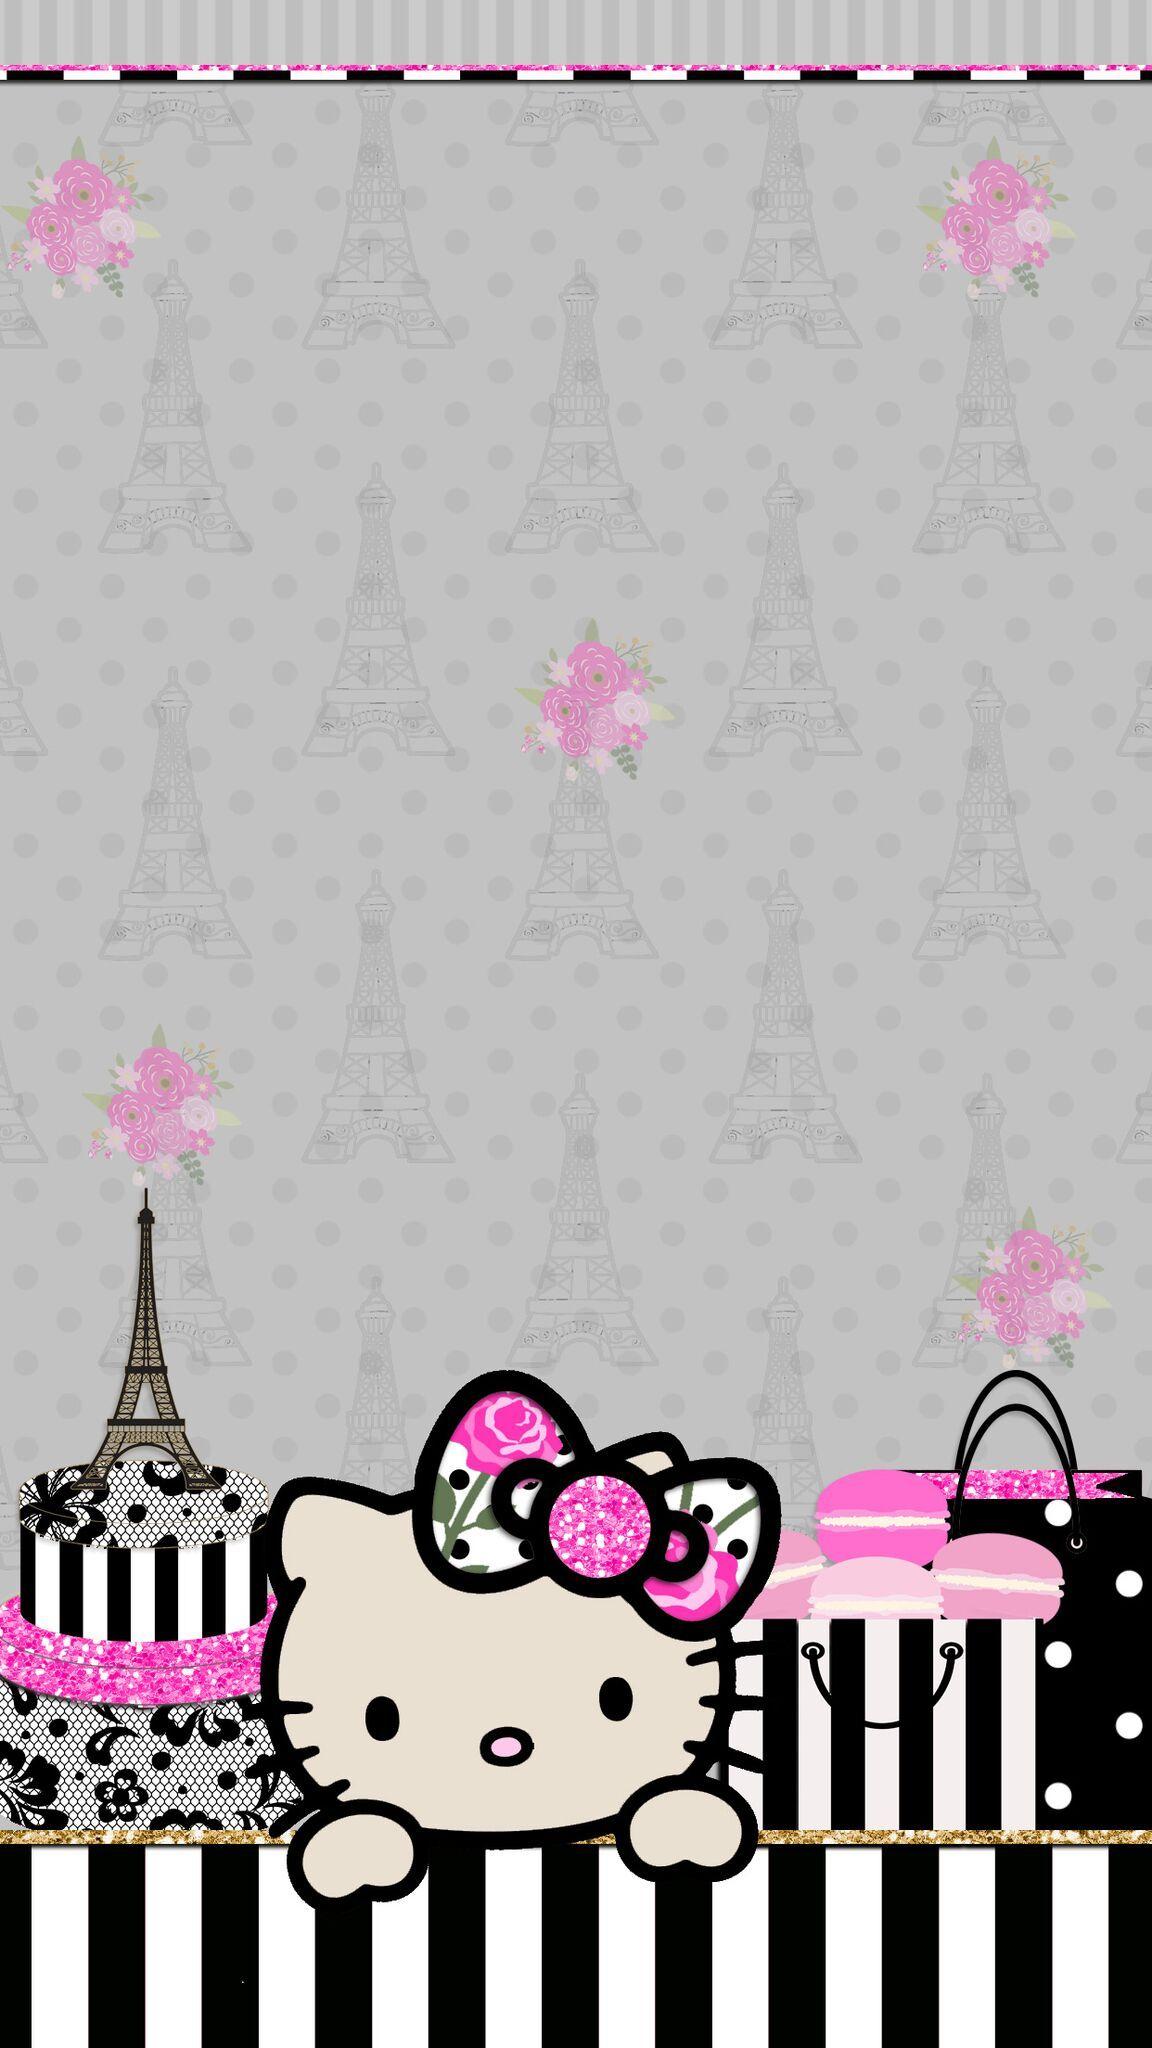 Great Wallpaper Hello Kitty Iphone 6 - 1cd9e871f49cc3fa4716011d8f4a3d15  Snapshot_444583.jpg